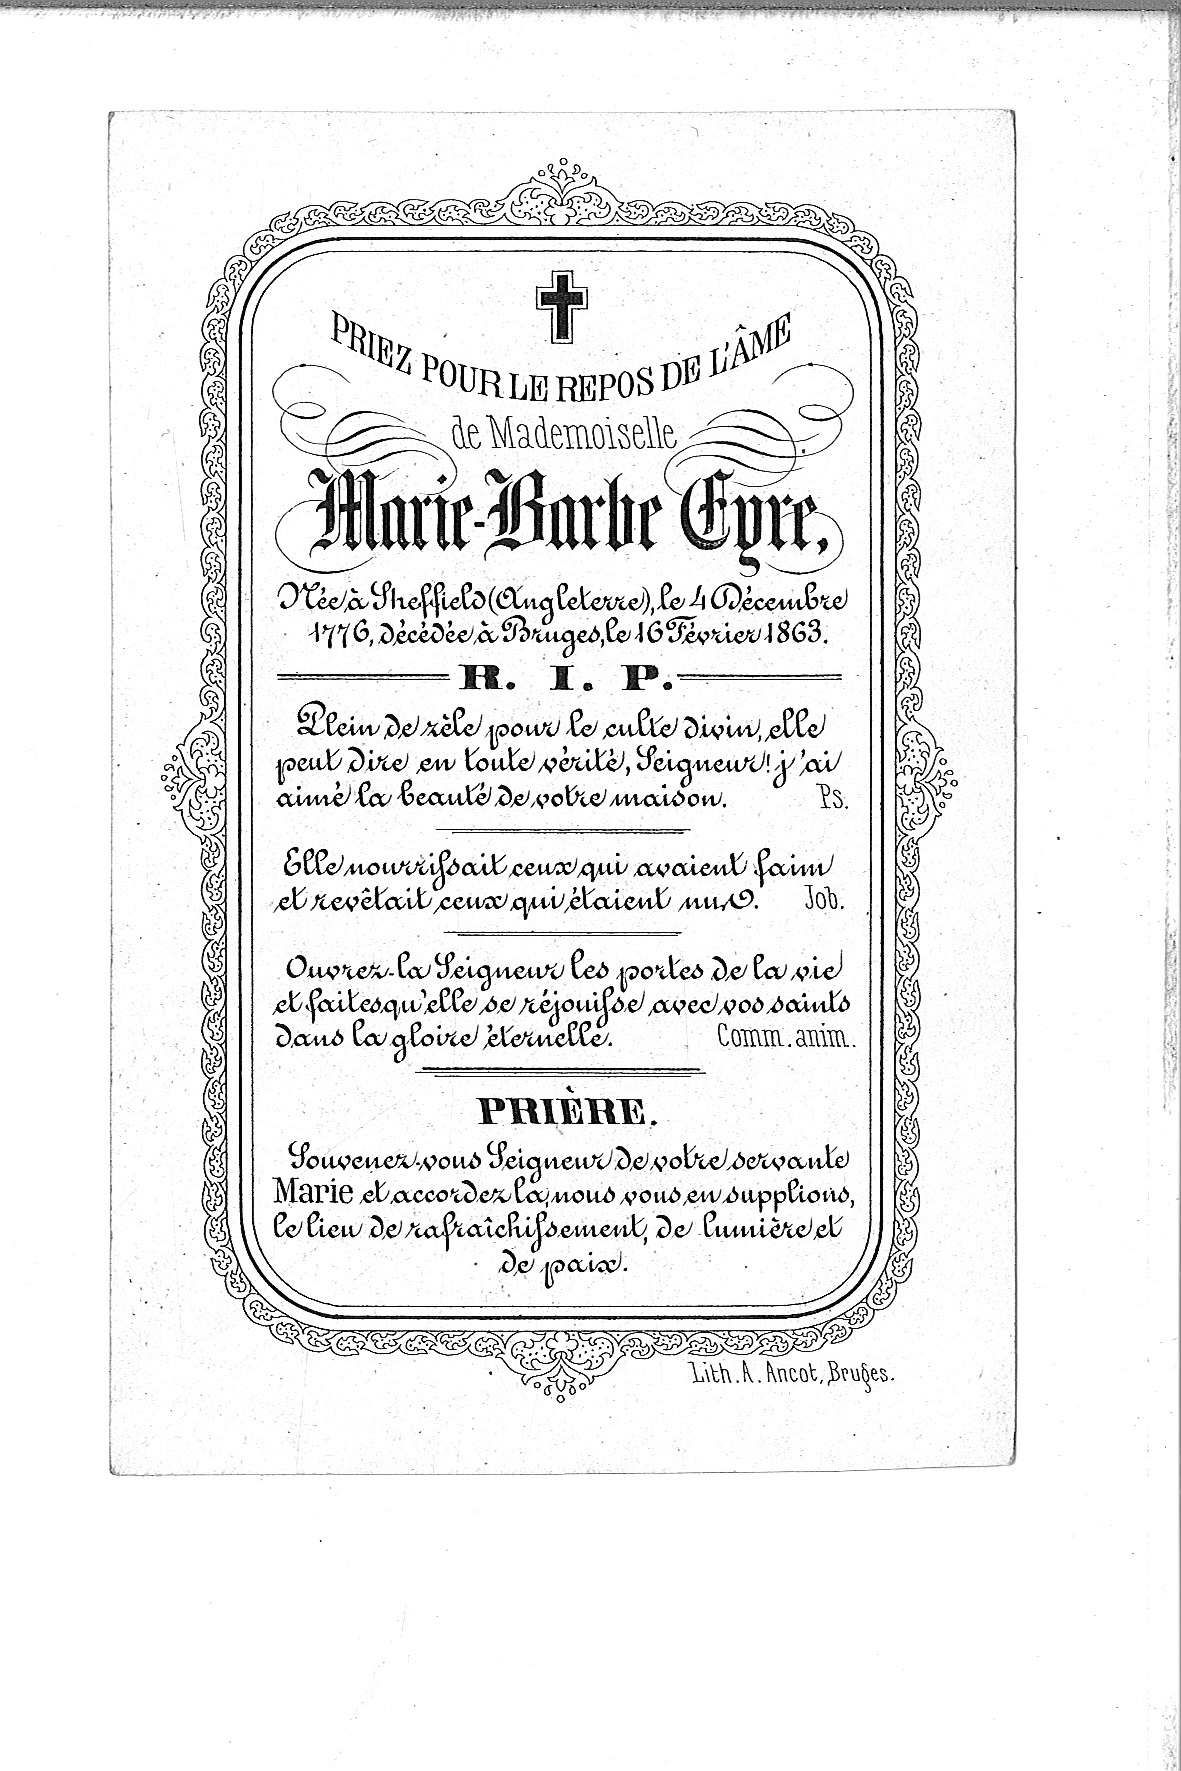 Marie-Barbe-(1863)-20121105162927_00191.jpg